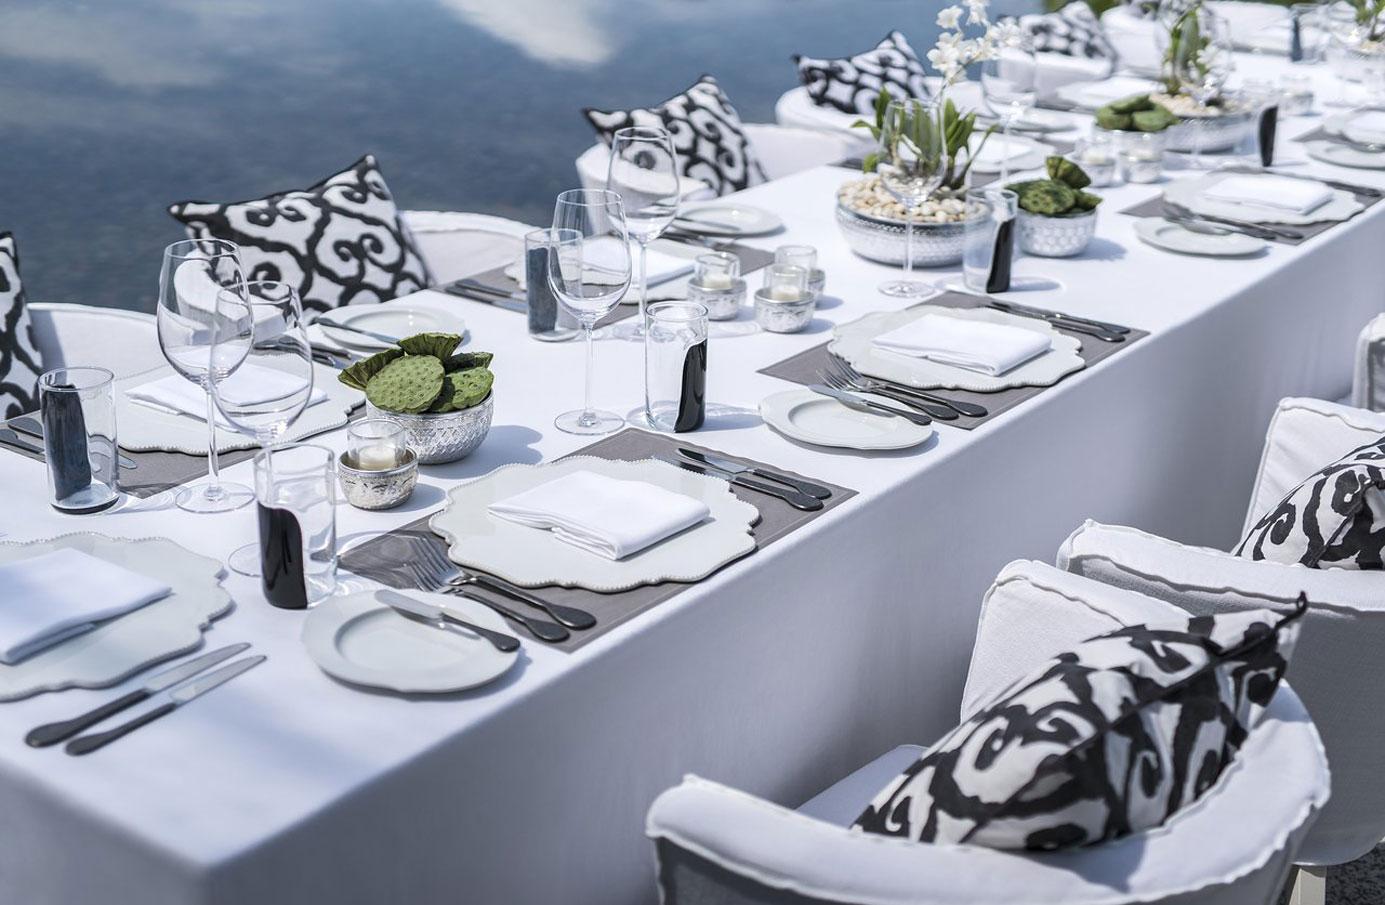 phuket-wedding-como (9)